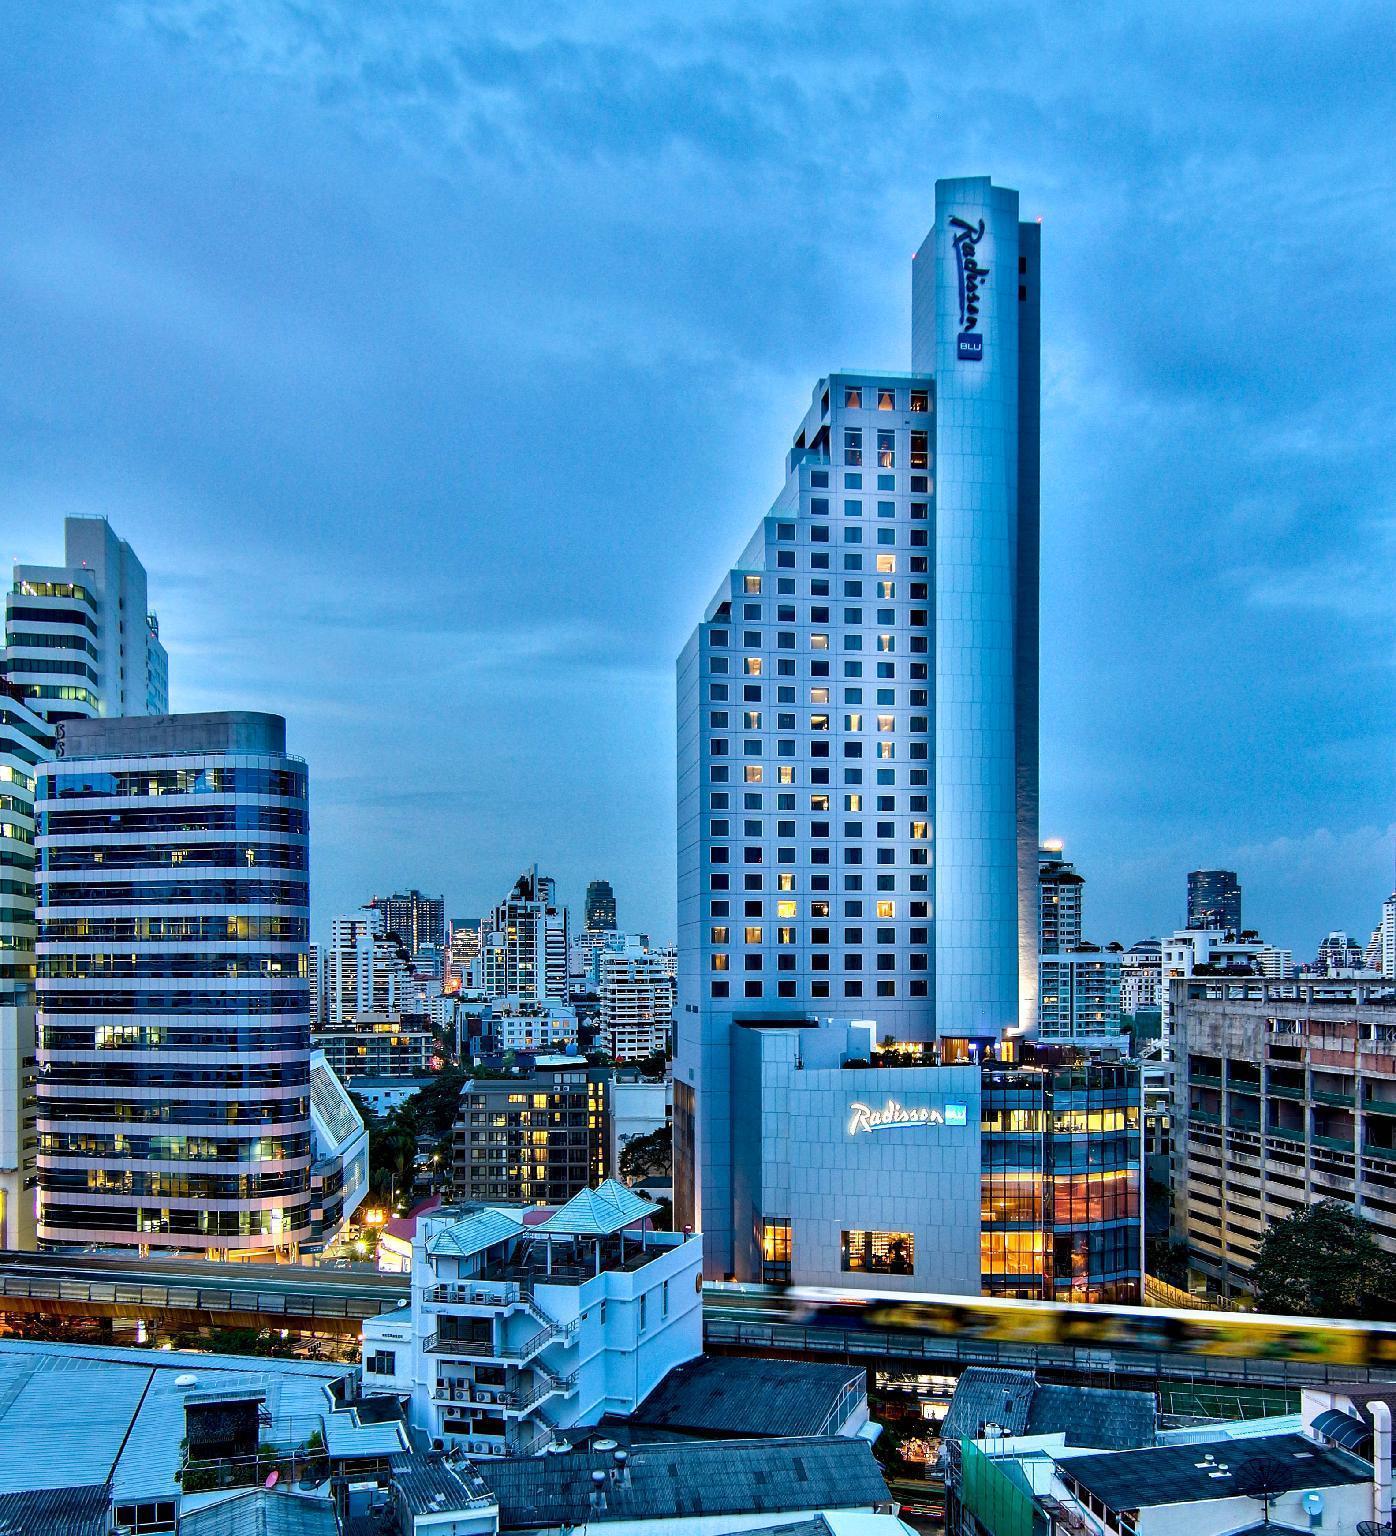 Radisson Blu Plaza Bangkok เรดิสัน บลู พลาซา บางกอก